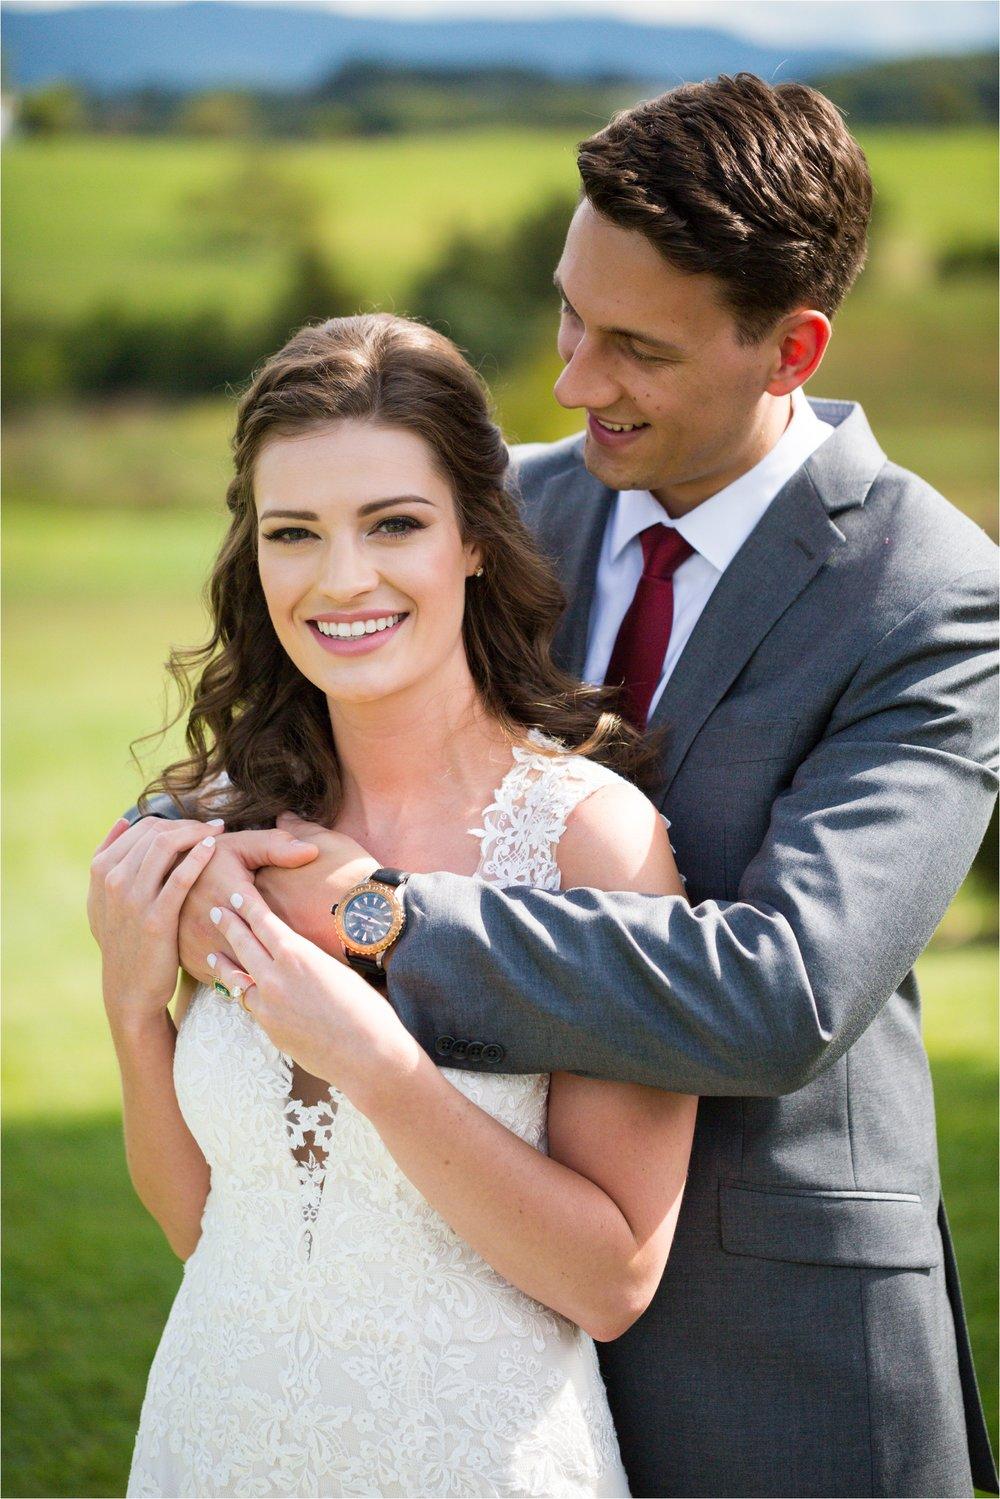 Feather-and-Oak-Photography-Cross-Keys-Vineyard-Wedding-0428.jpg